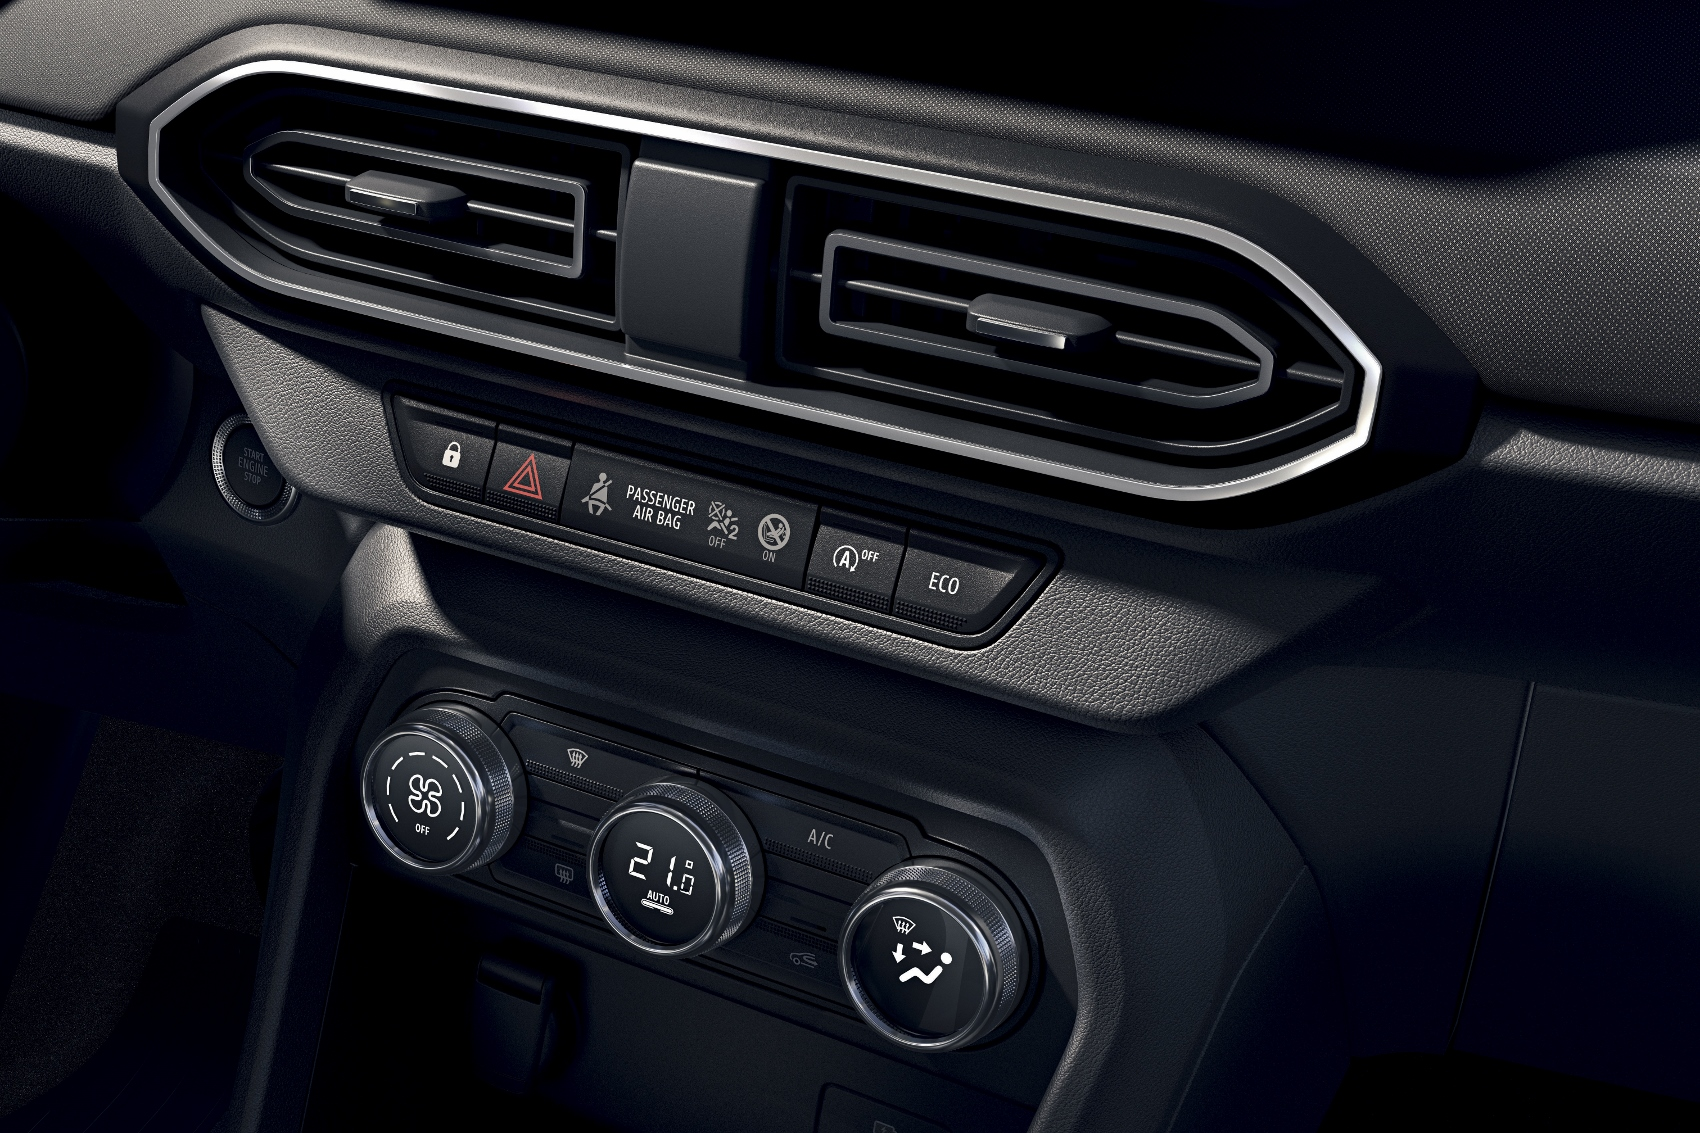 2020 - New Dacia SANDERO (11) (1700x1133)